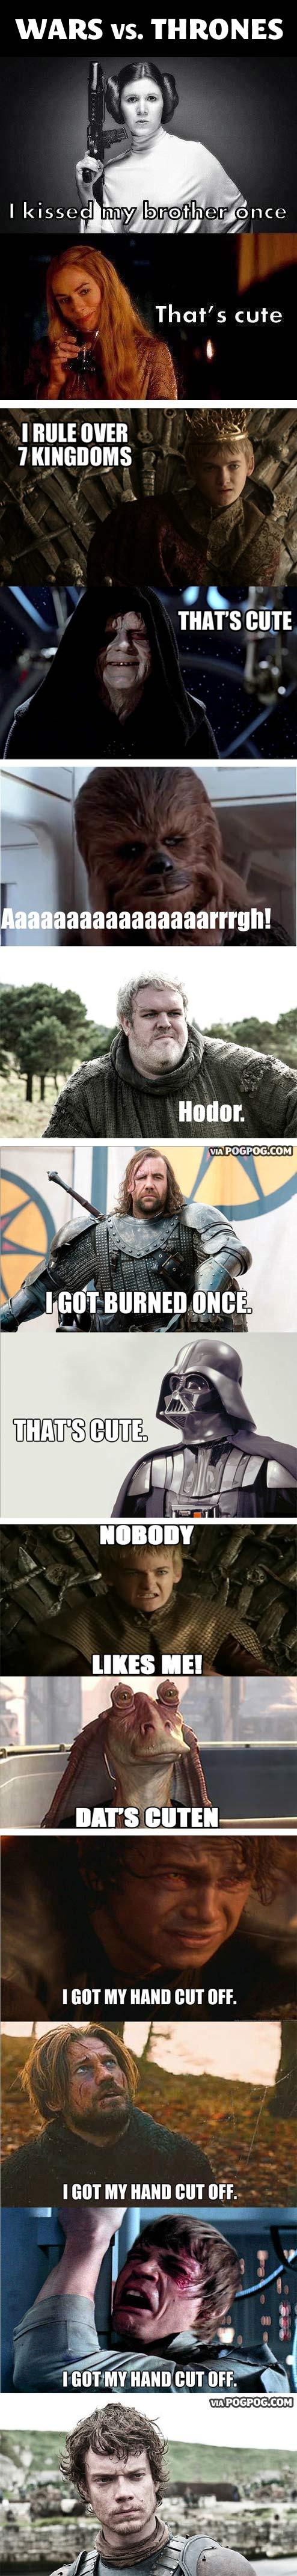 funny-Star-Wars-vs-Game-Thrones